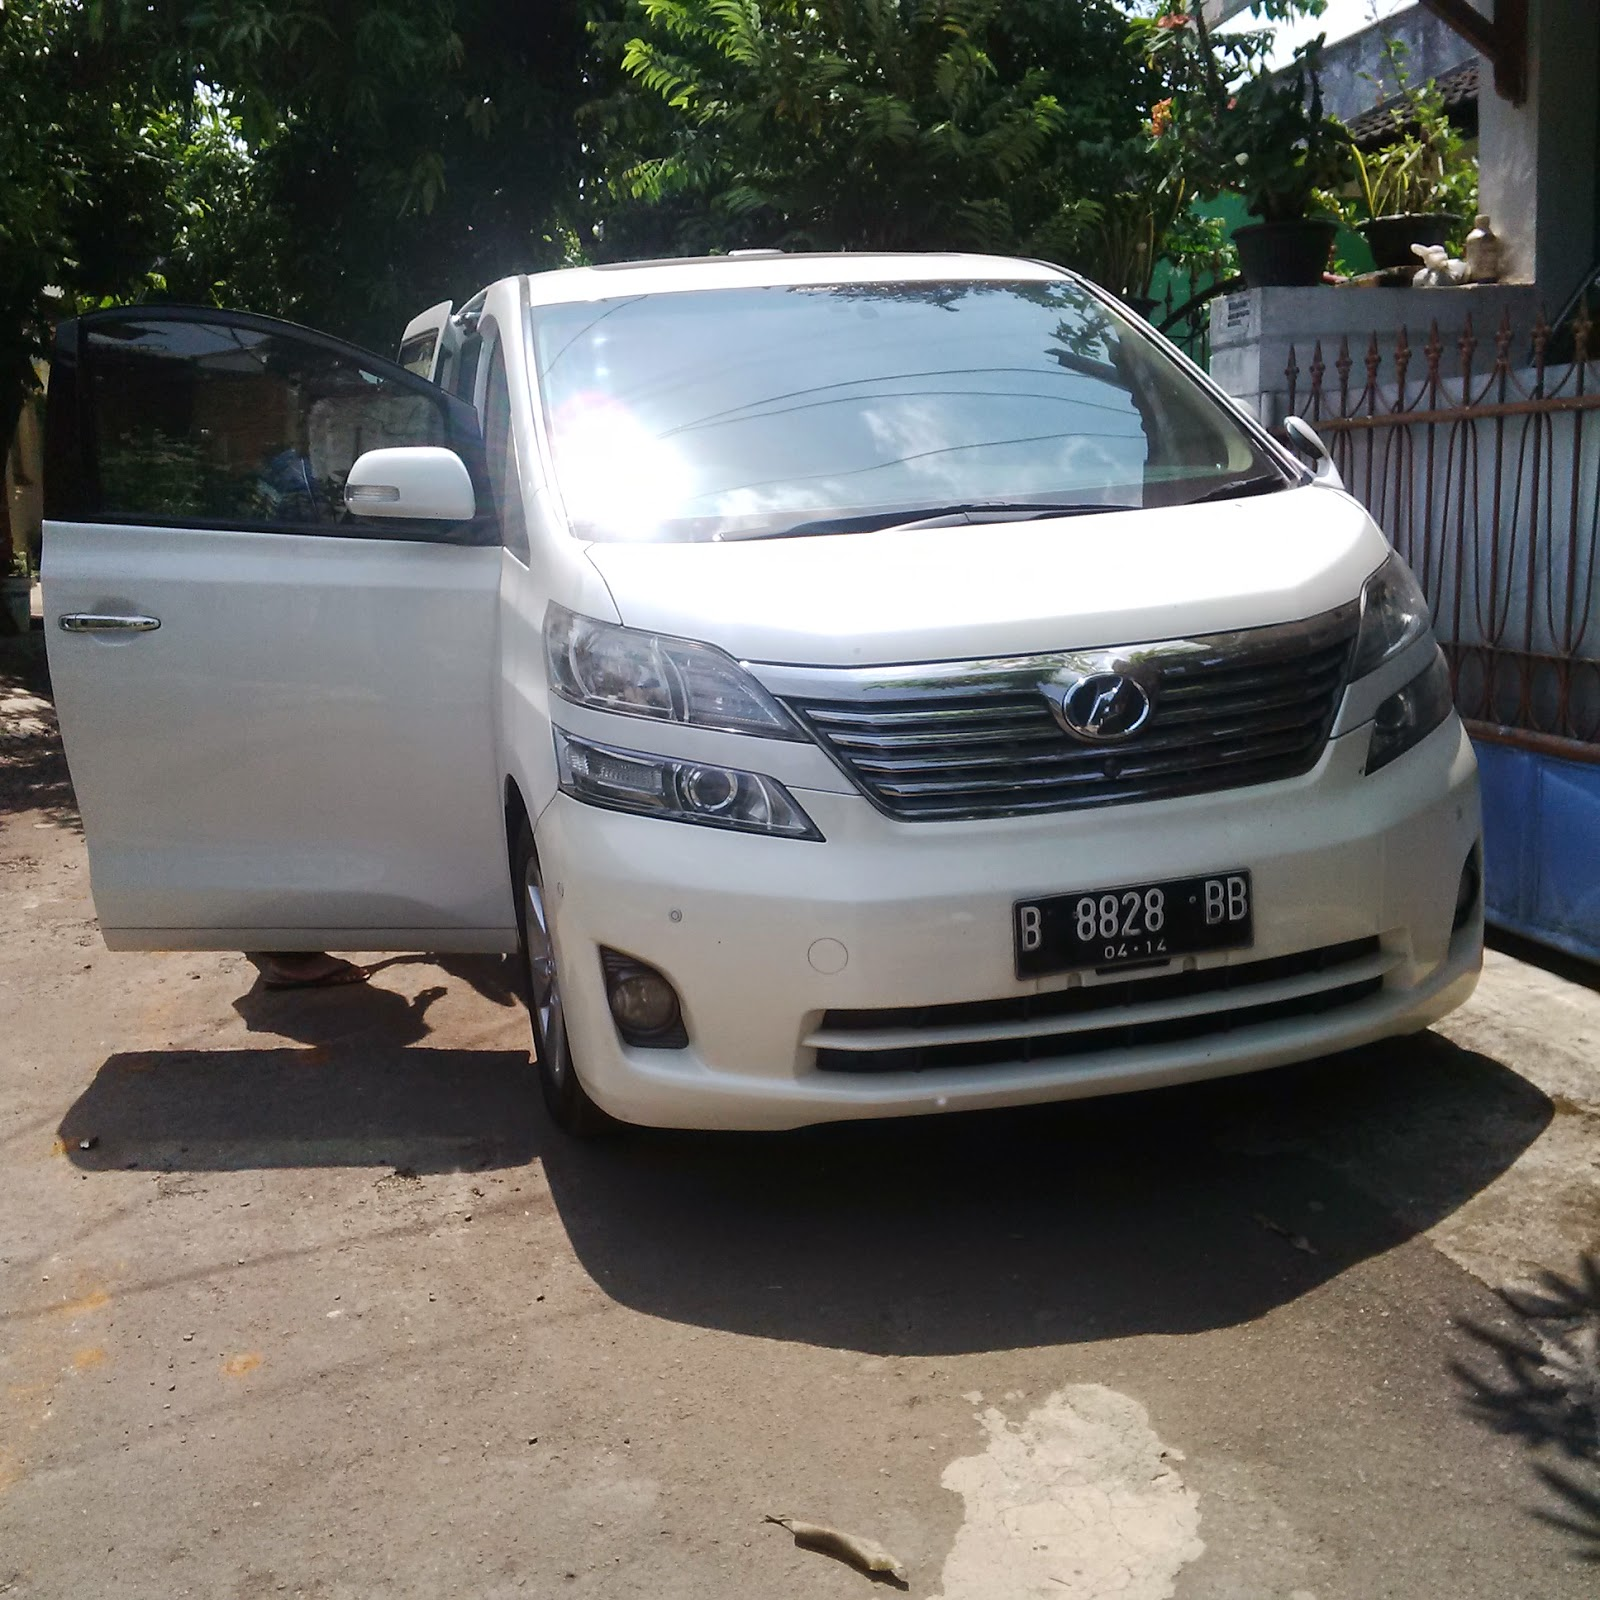 Pengiriman Toyota Velvire B 8828 BB Surabaya ke Jakarta